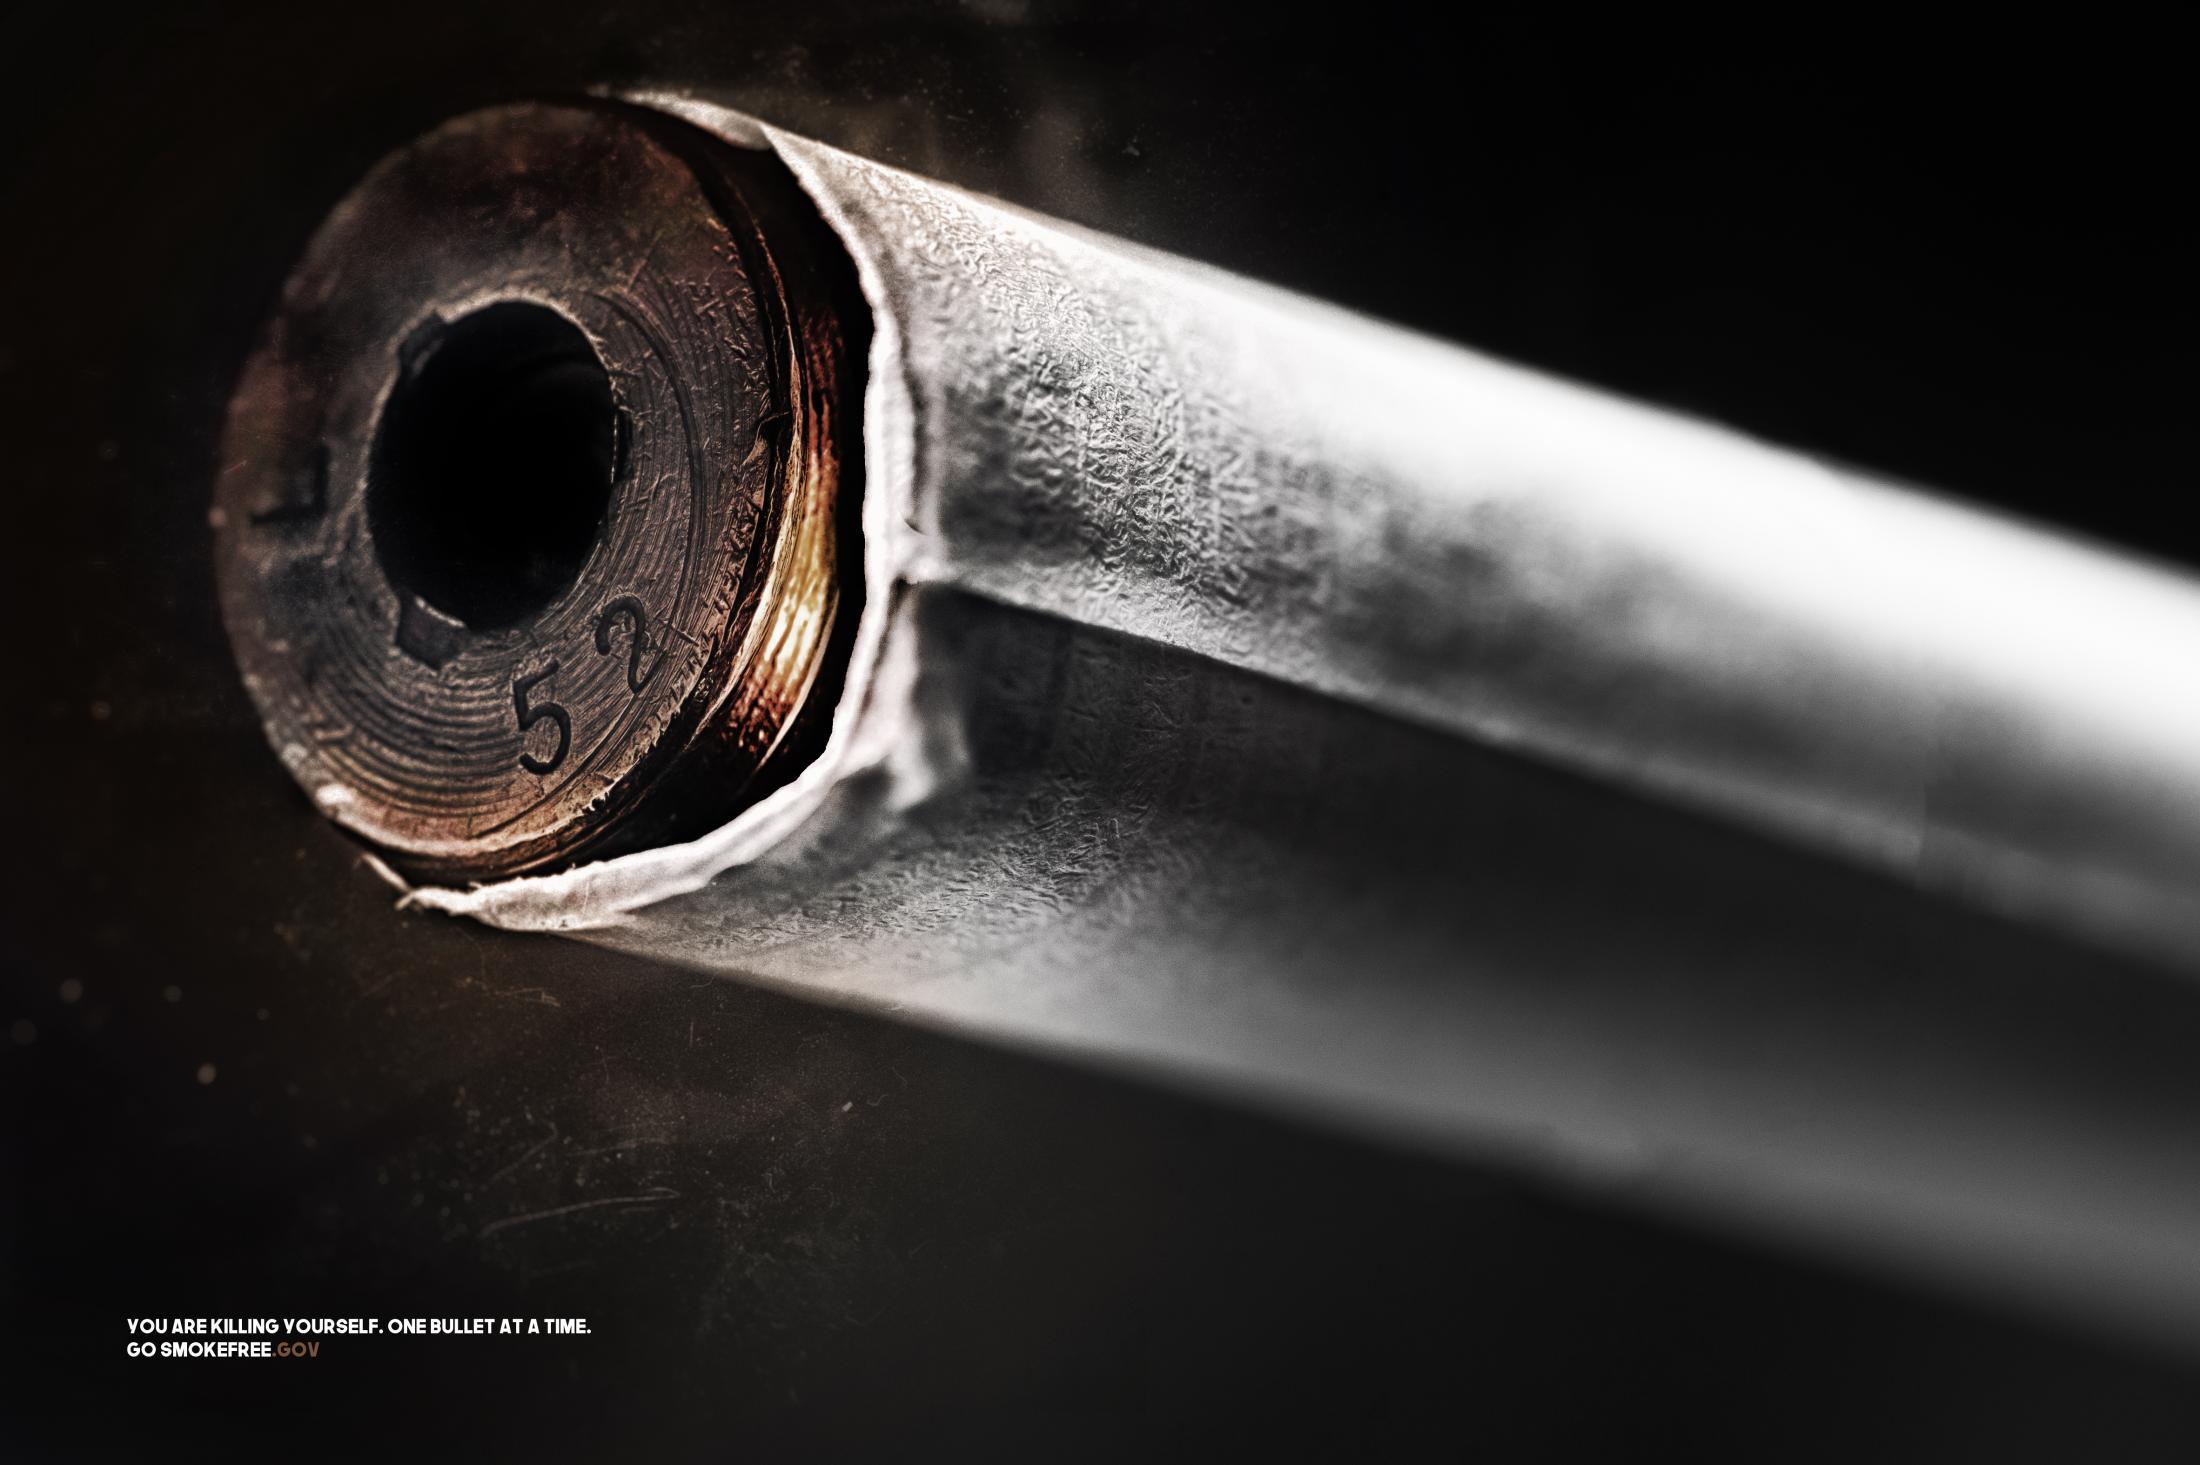 Smokefree.gov Print Ad - The Bullet